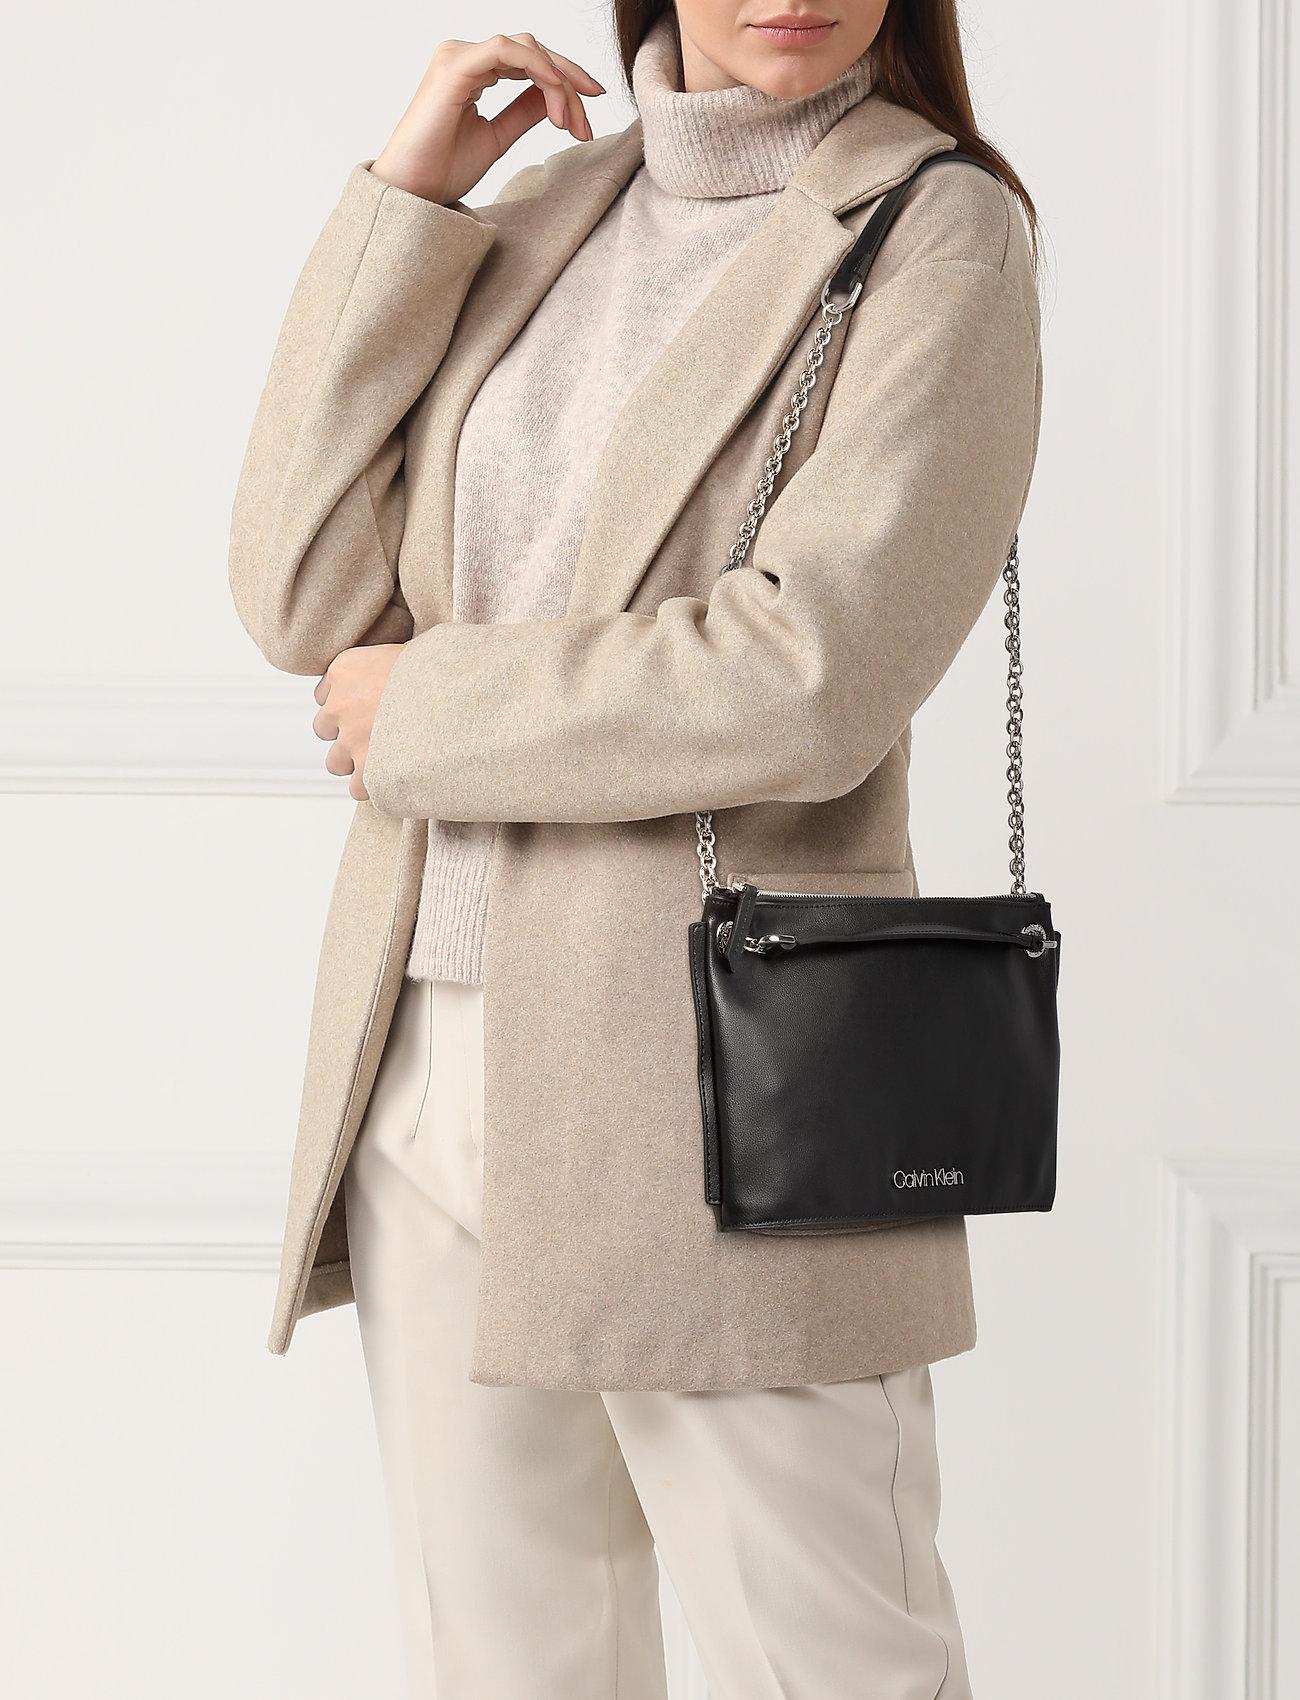 Calvin Klein CHAINED CONV SHOULDERBAG - BLACK